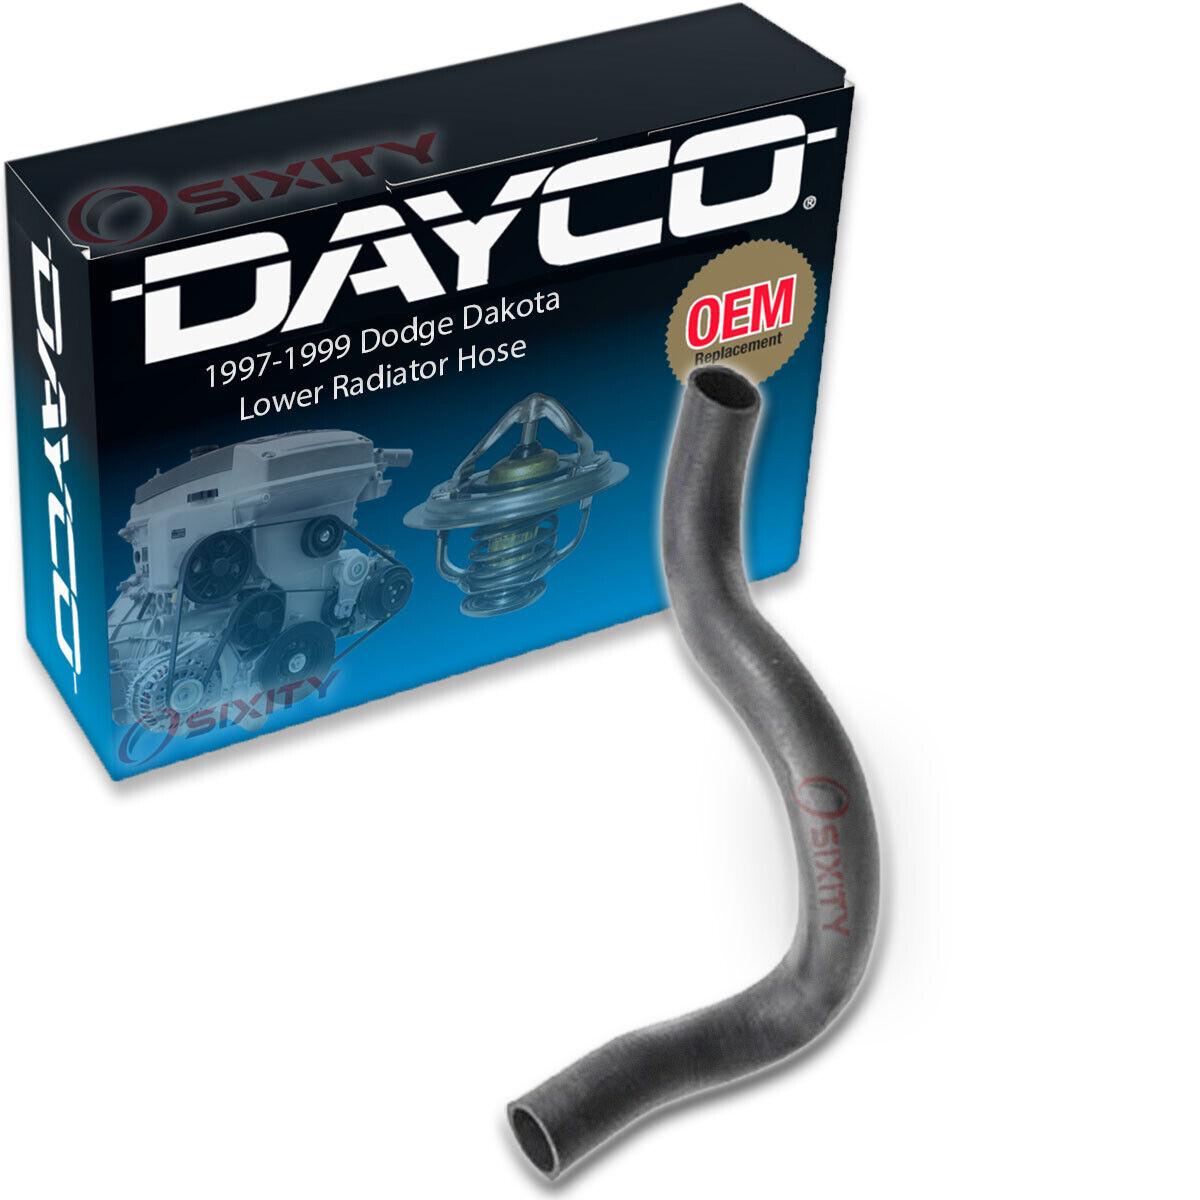 Engine dv Dayco Lower Radiator Hose for 1997-1999 Dodge Dakota 3.9L V6